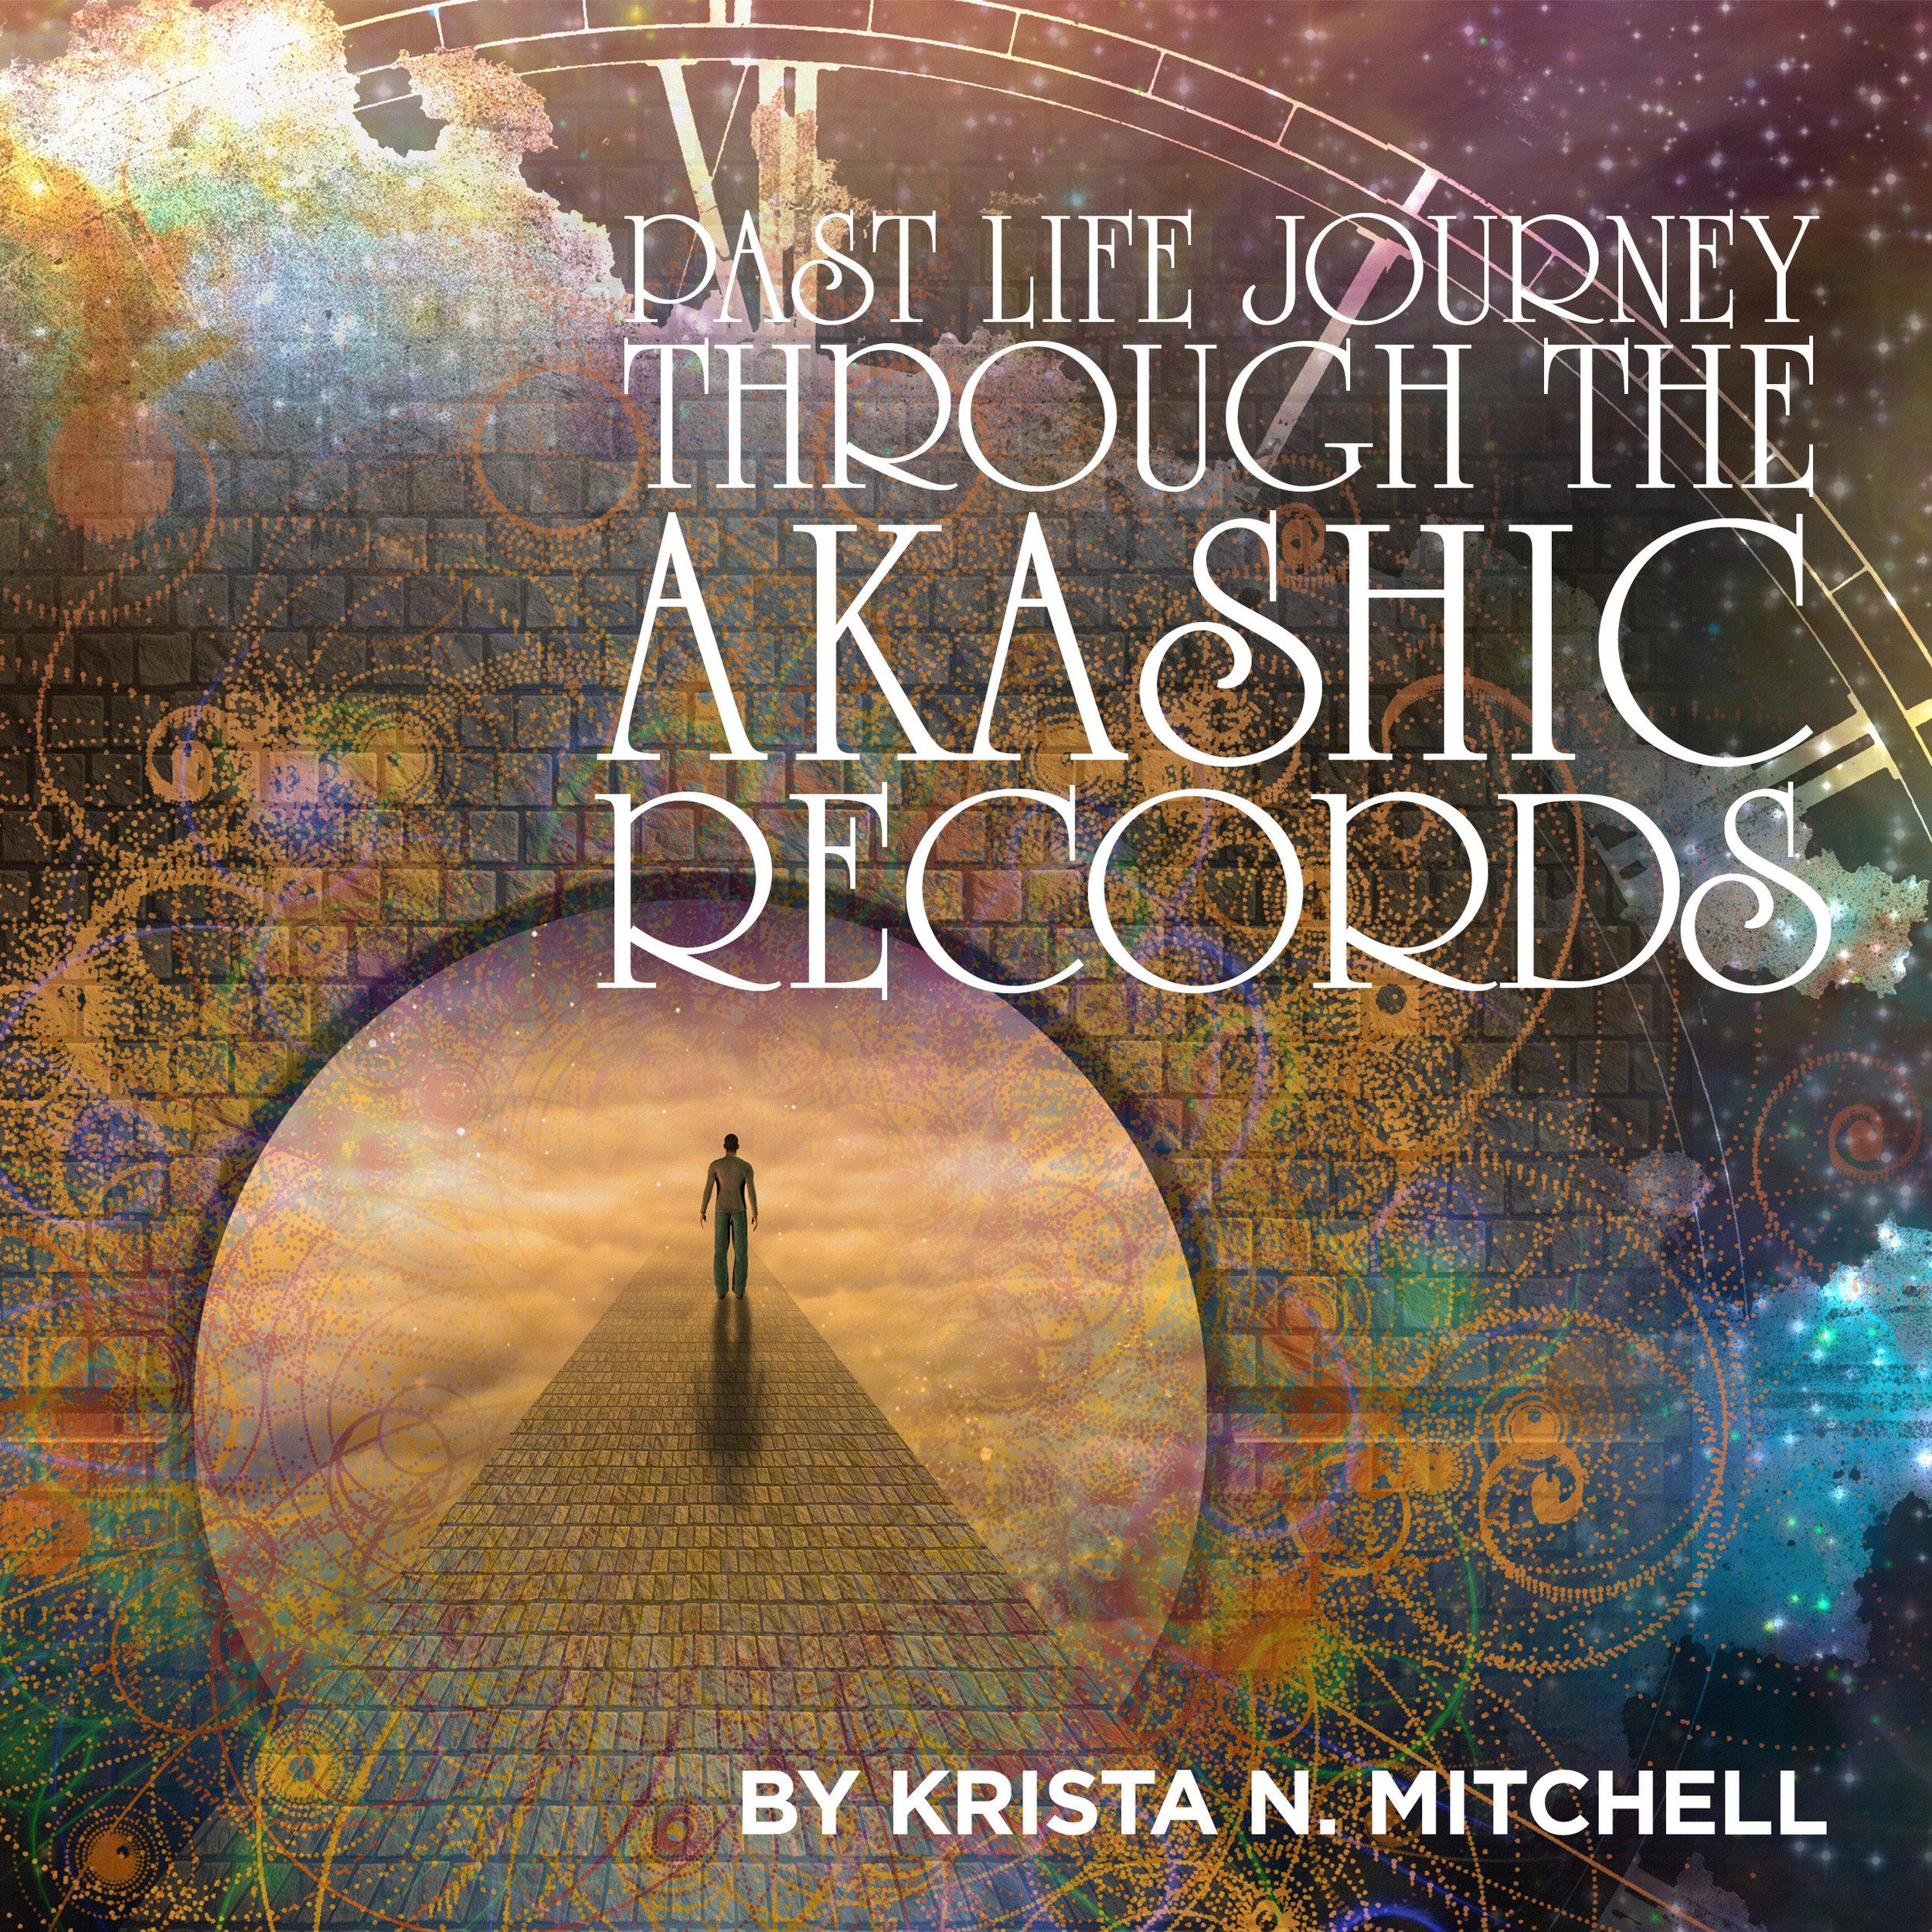 Past Life Journey Through the Akashic Records / krista-mitchell.com